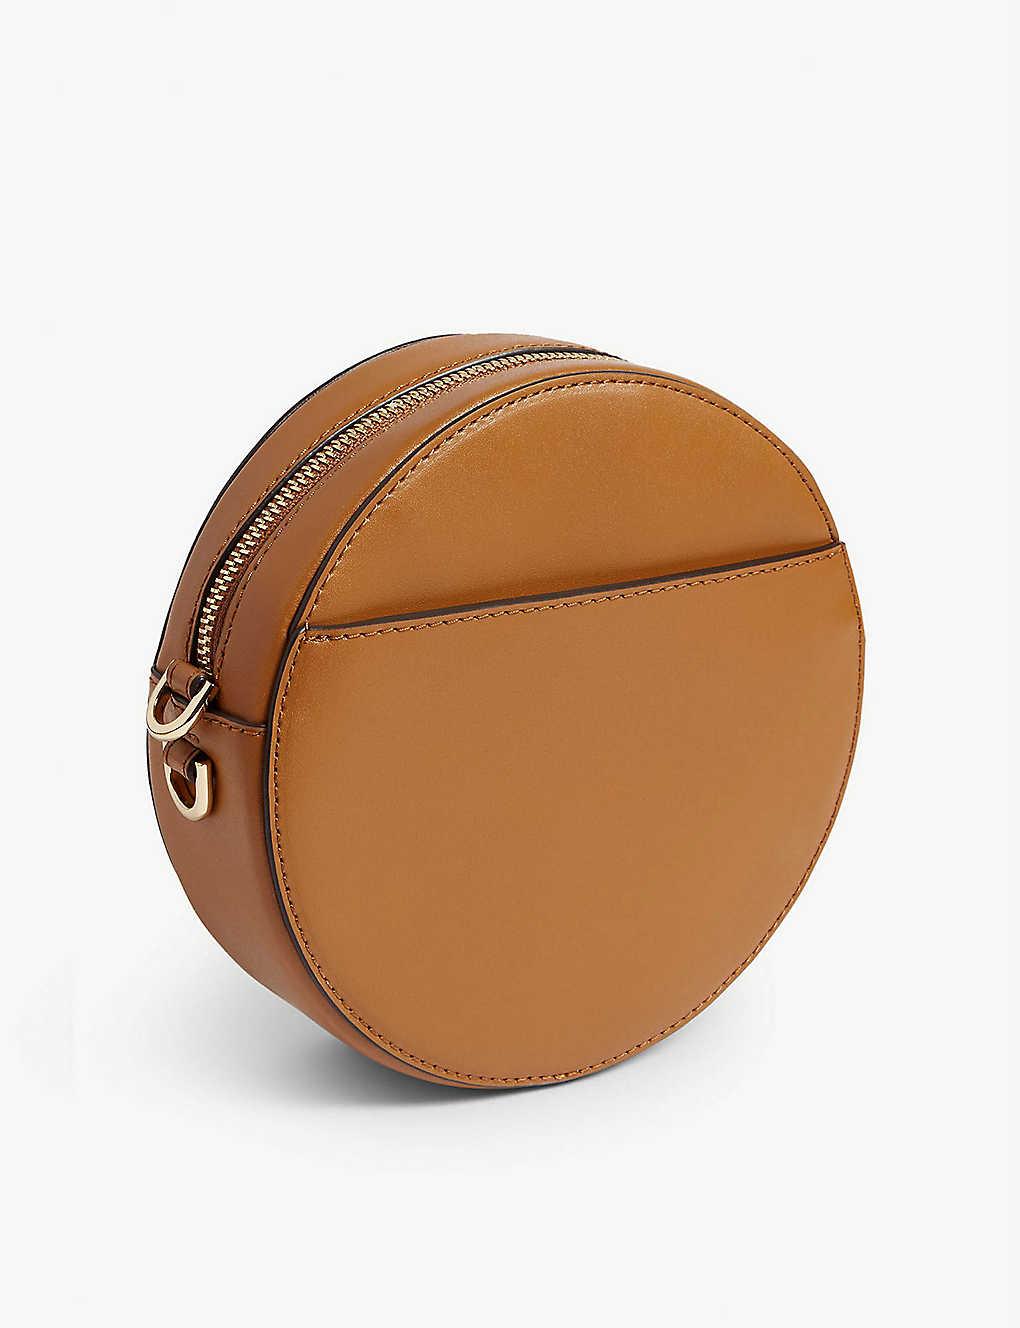 4fec4eb95019 MICHAEL MICHAEL KORS - Canteen studded leather cross-body bag ...